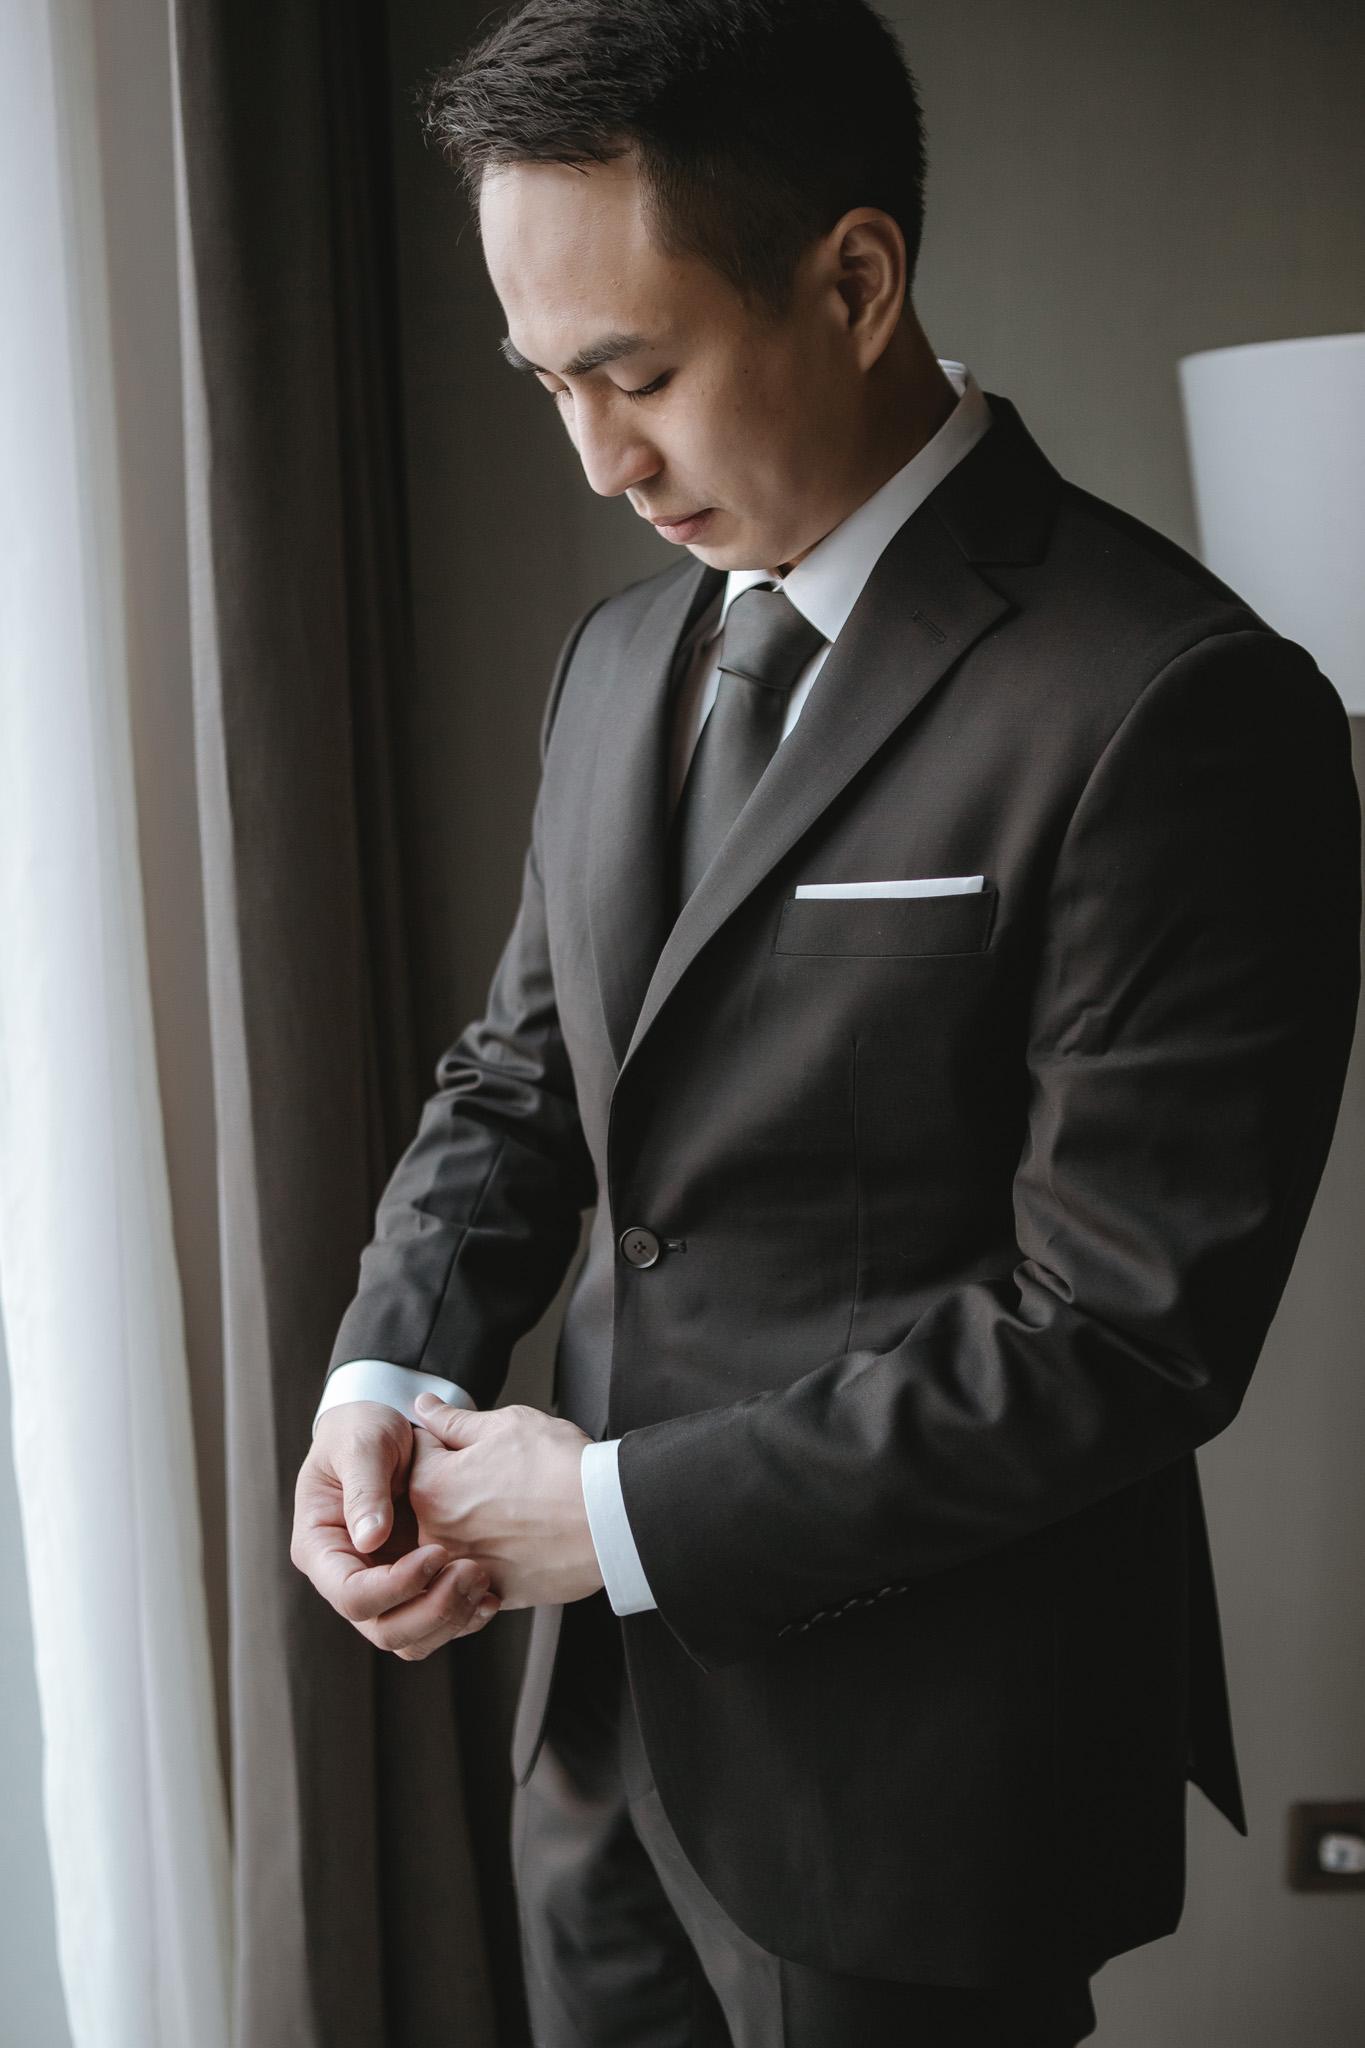 EW 居米 台北禮服 台北婚紗 台北婚攝 國泰萬怡 台北婚禮-8